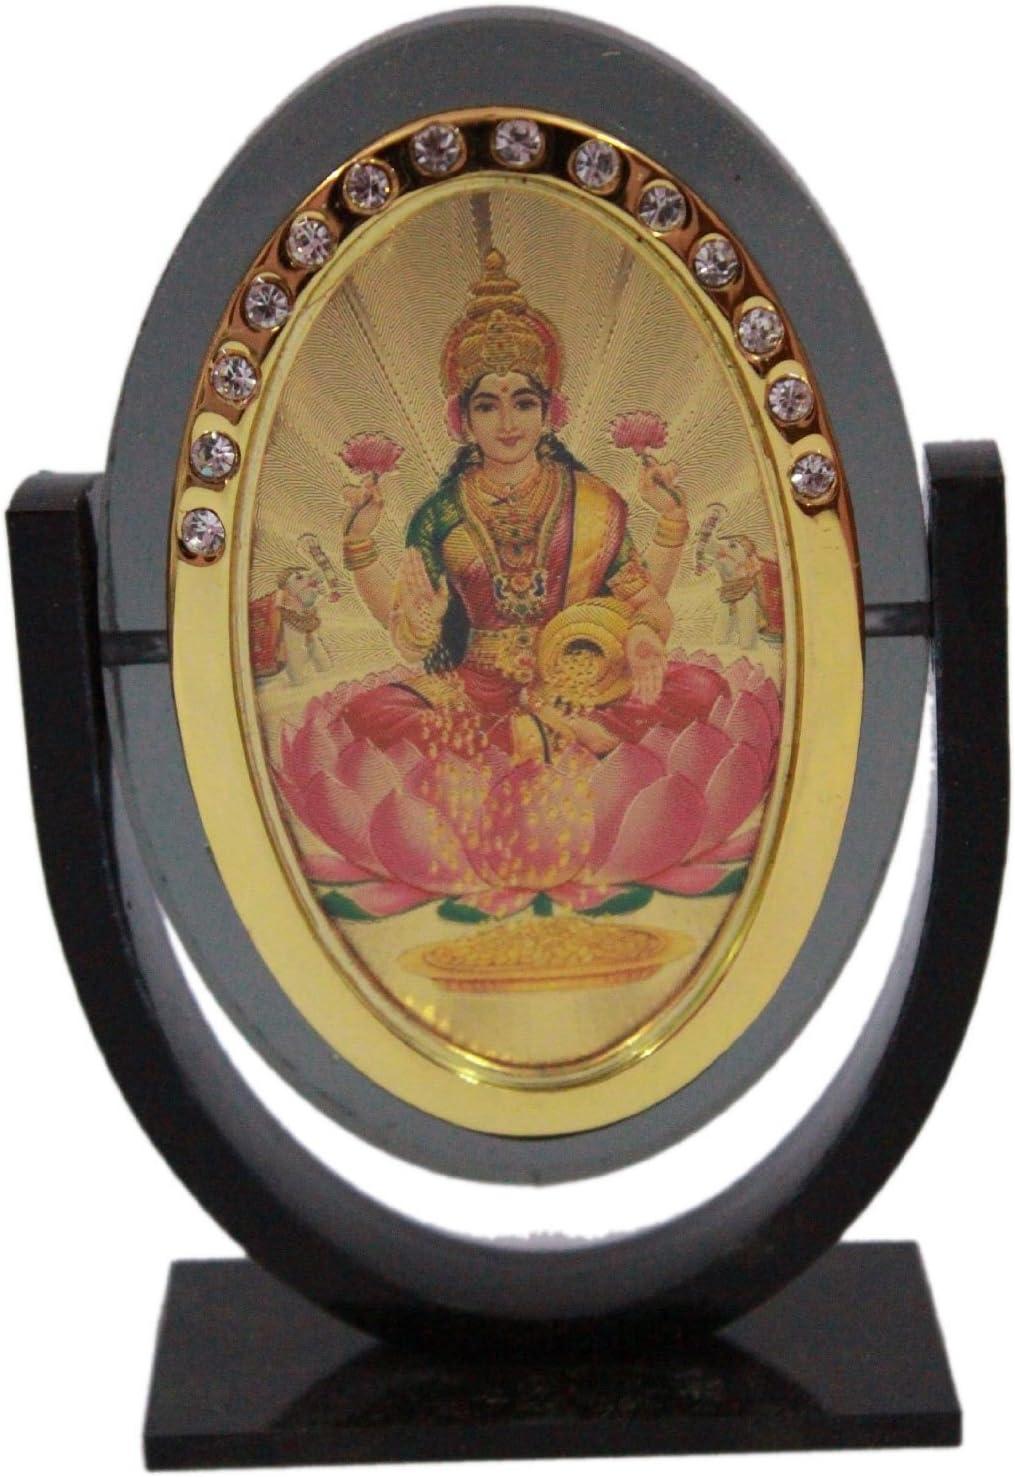 Odishabazaar Goddess Lakshmi Idol for Car Dashboard/Home/Office/Perfect Gift Item - 3 X 2.5 Inch